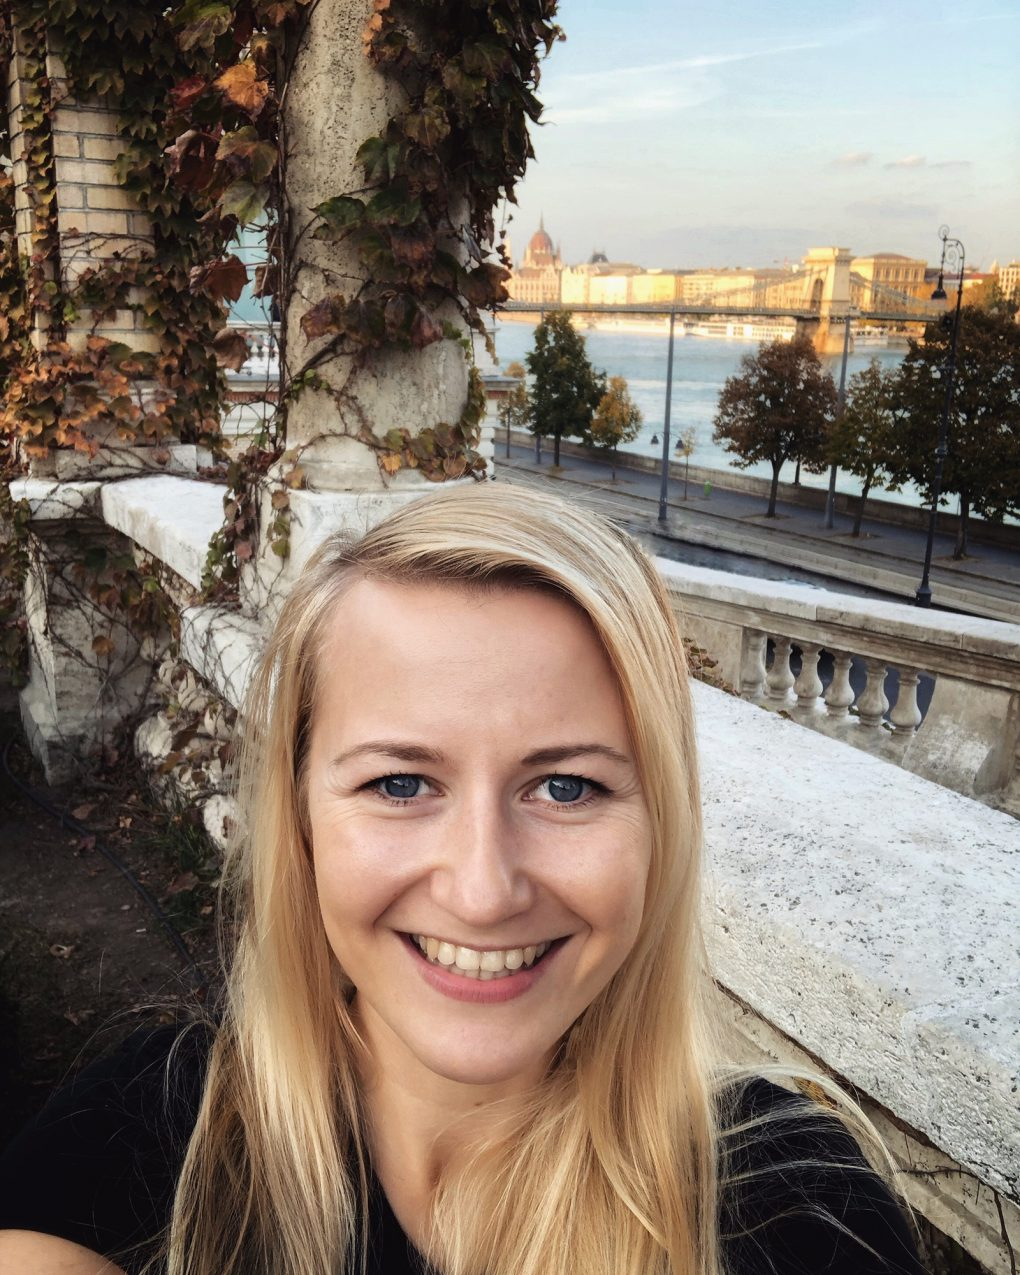 Budapest selfie